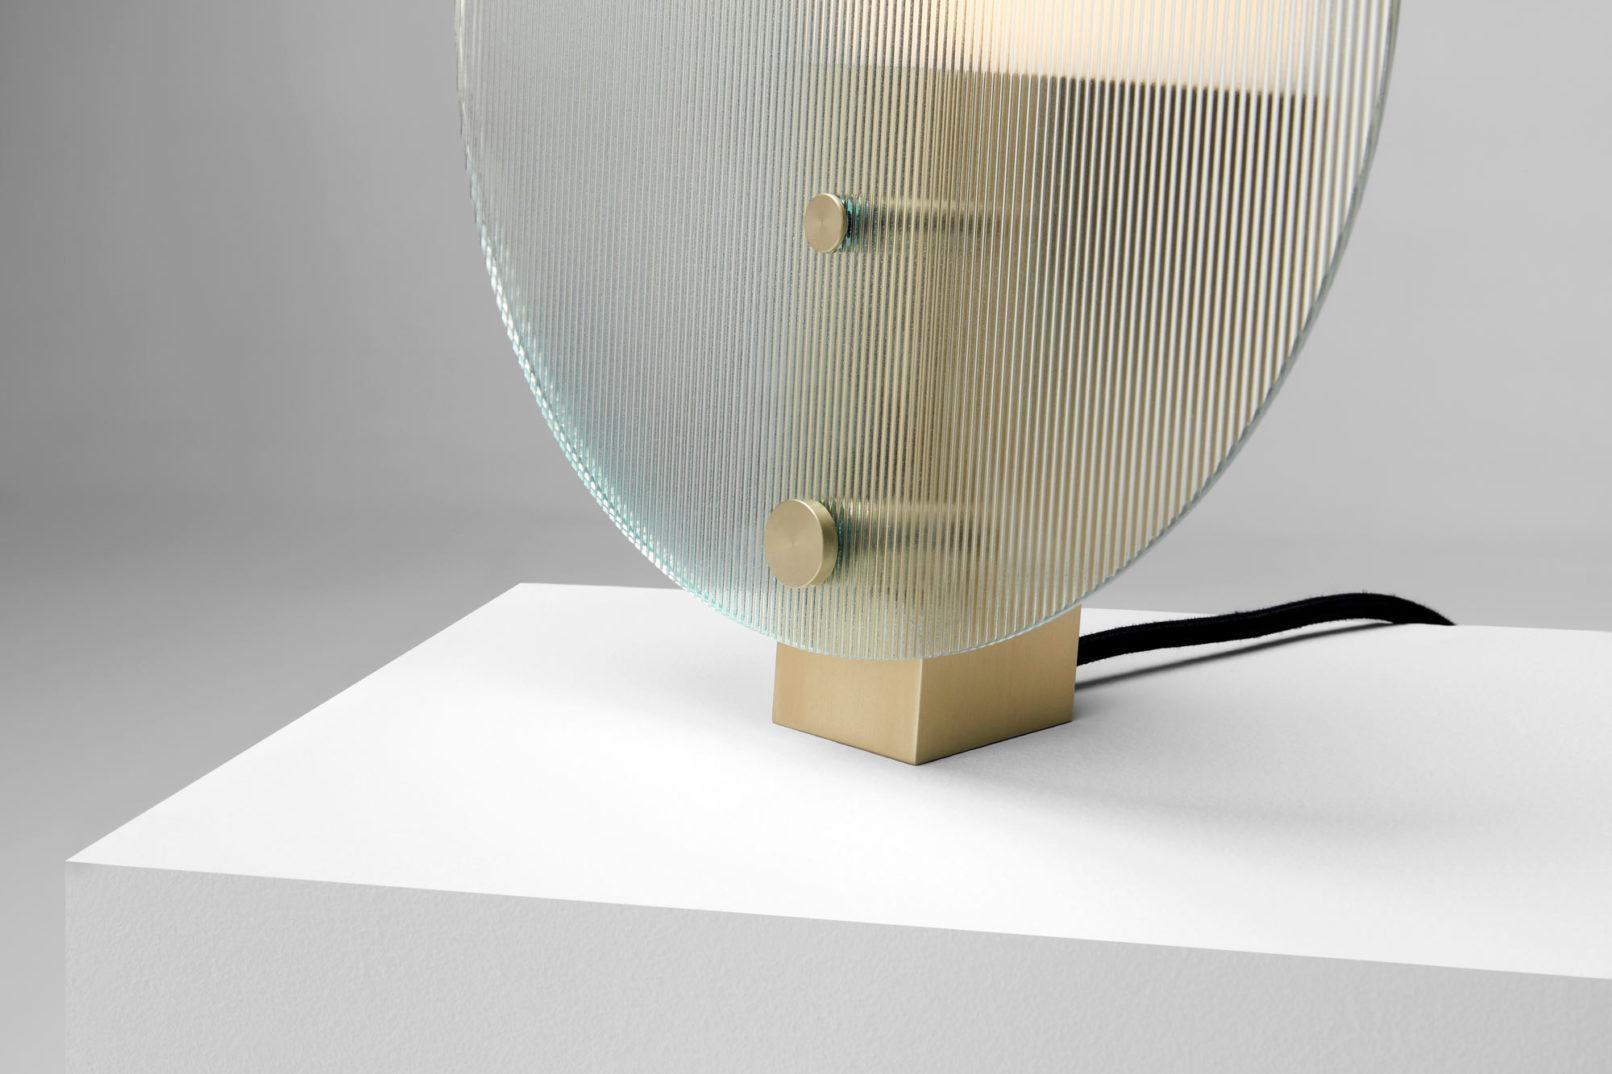 Nebulae_Desk_Lamp_4-1-1612x1074.jpg